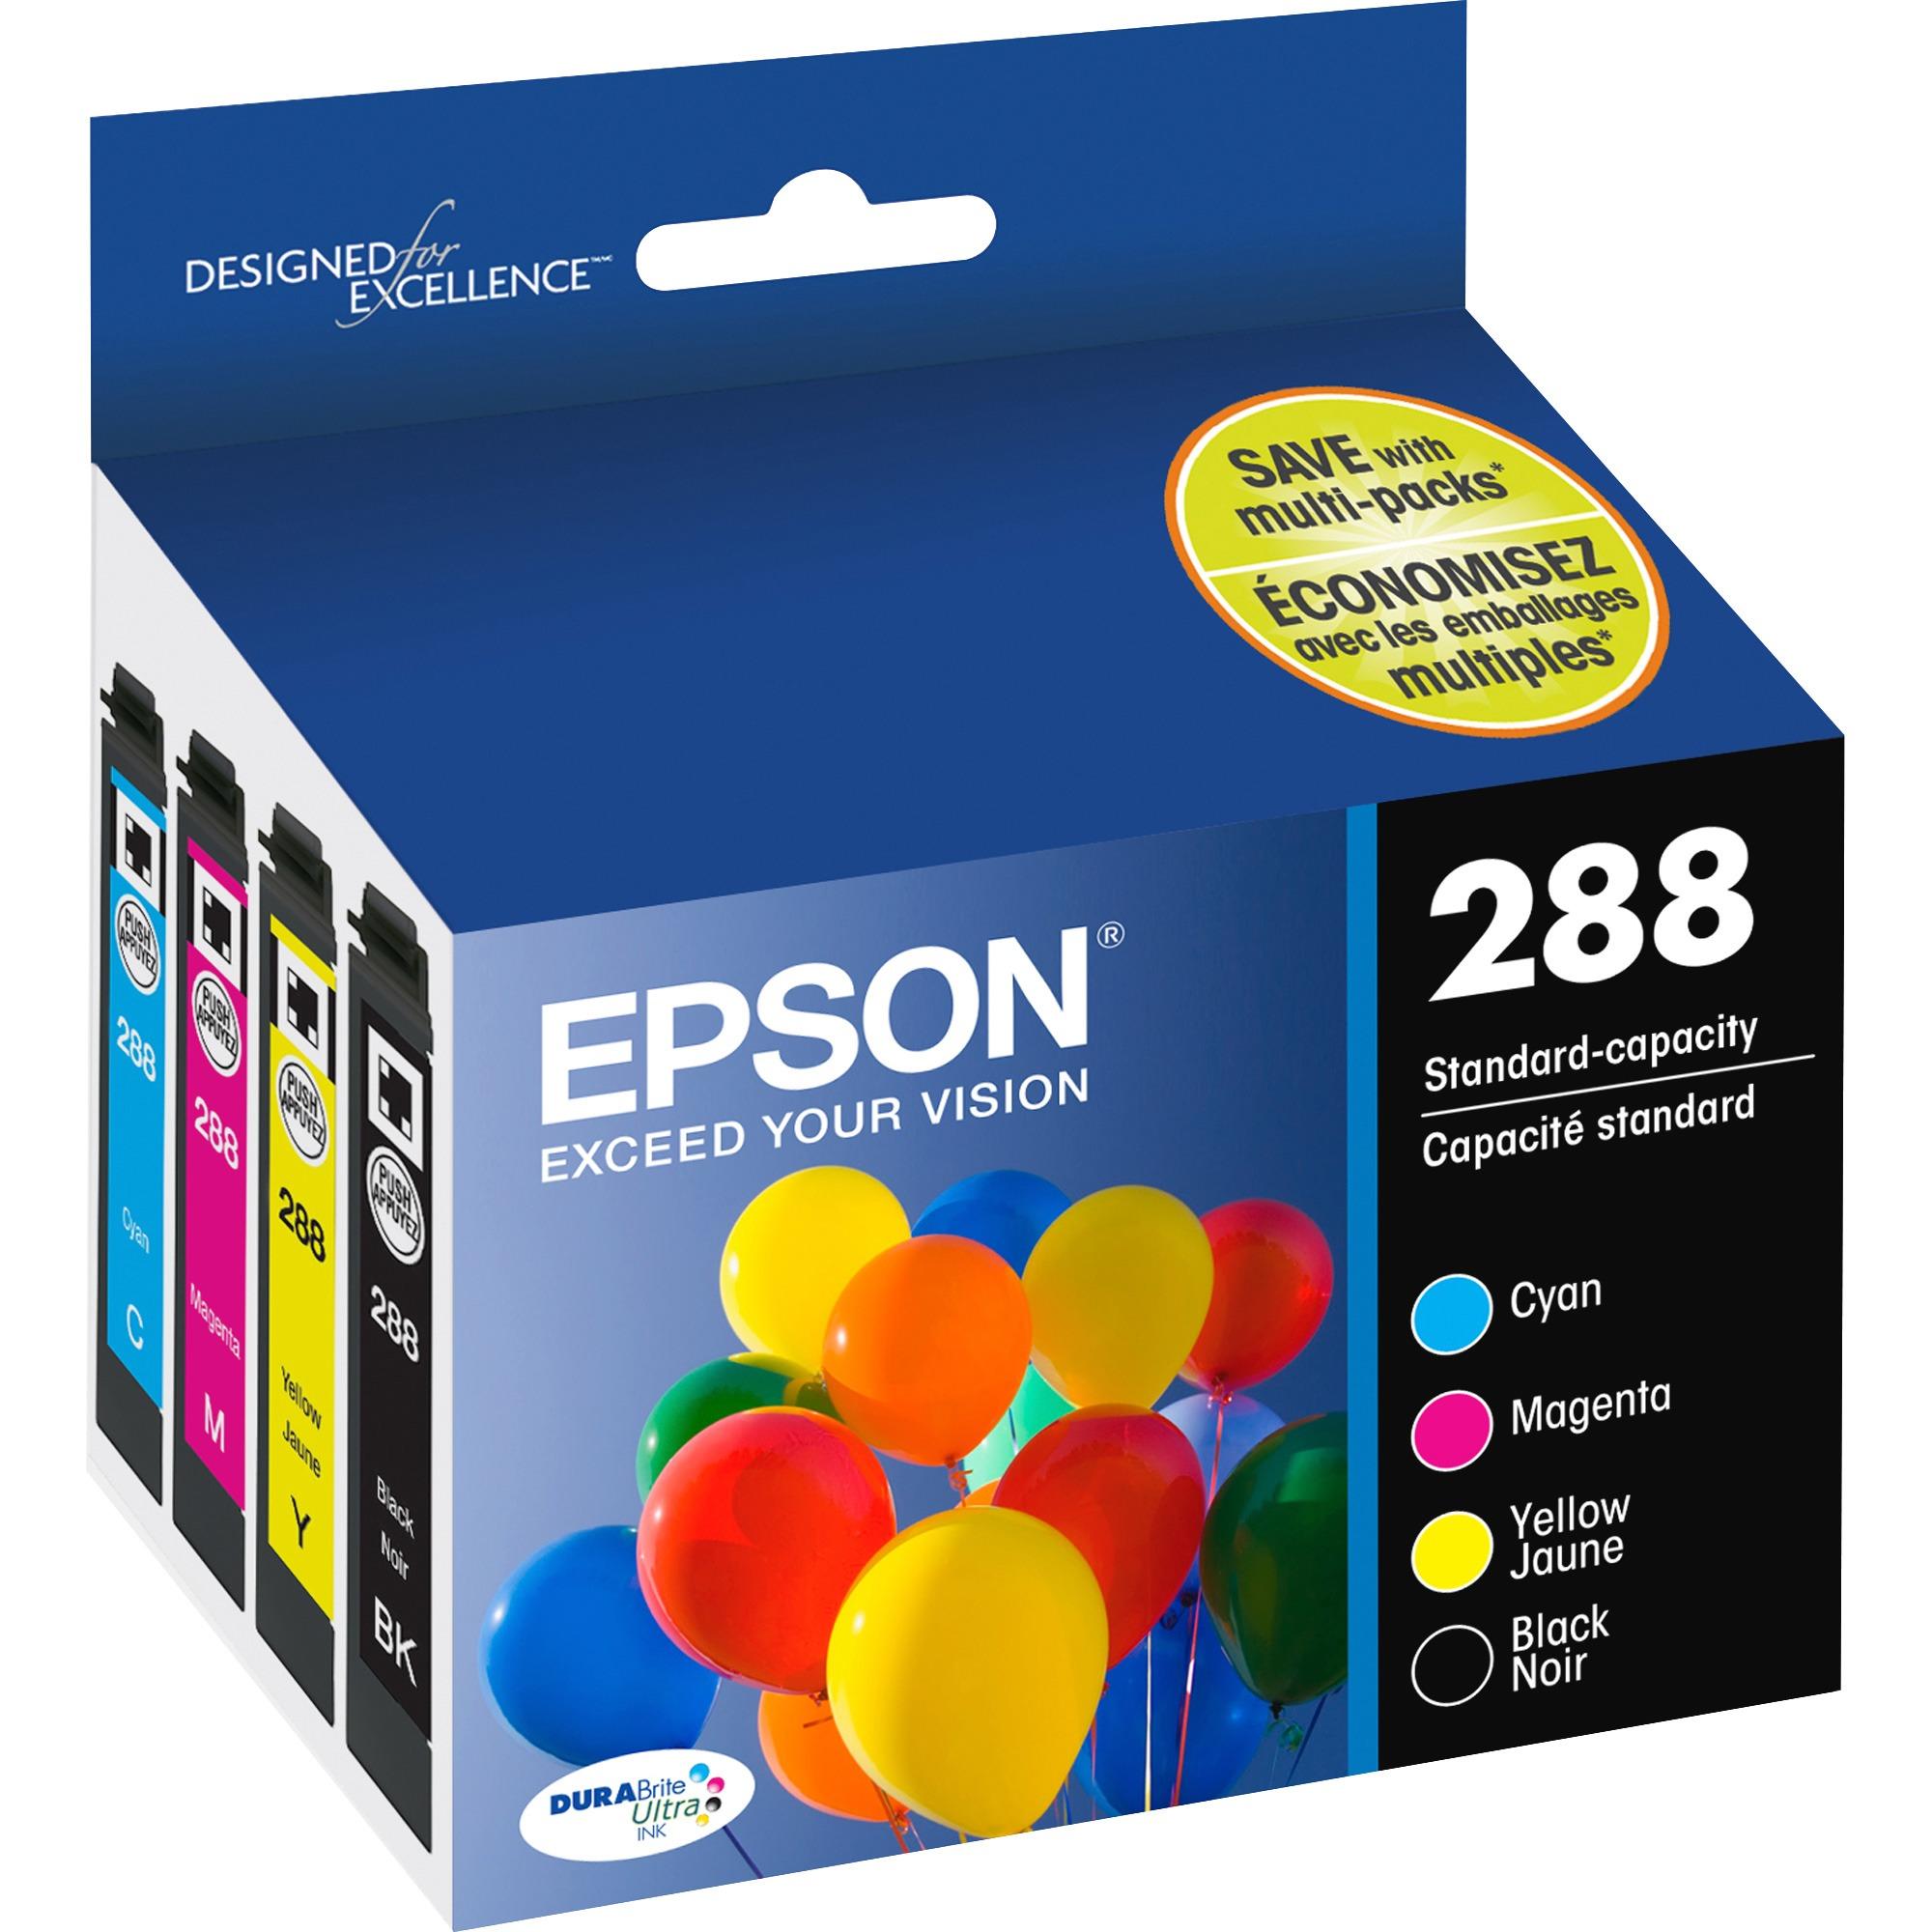 Epson 288 DURABrite Ultra Original Ink Cartridge Black, Cyan, Magenta, Yellow by Epson